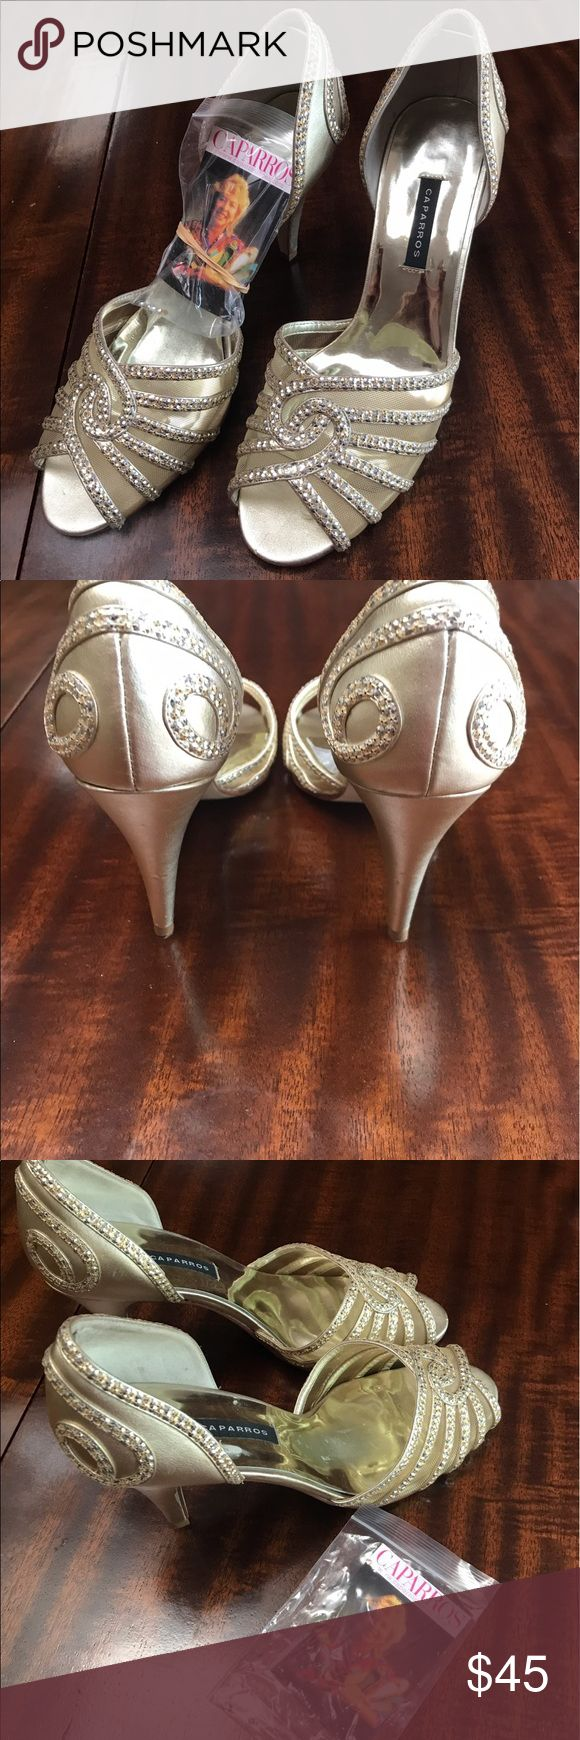 Caparros gold open toe pumps Beautiful gold sequined heels in excellent condition. Caparros Shoes Heels